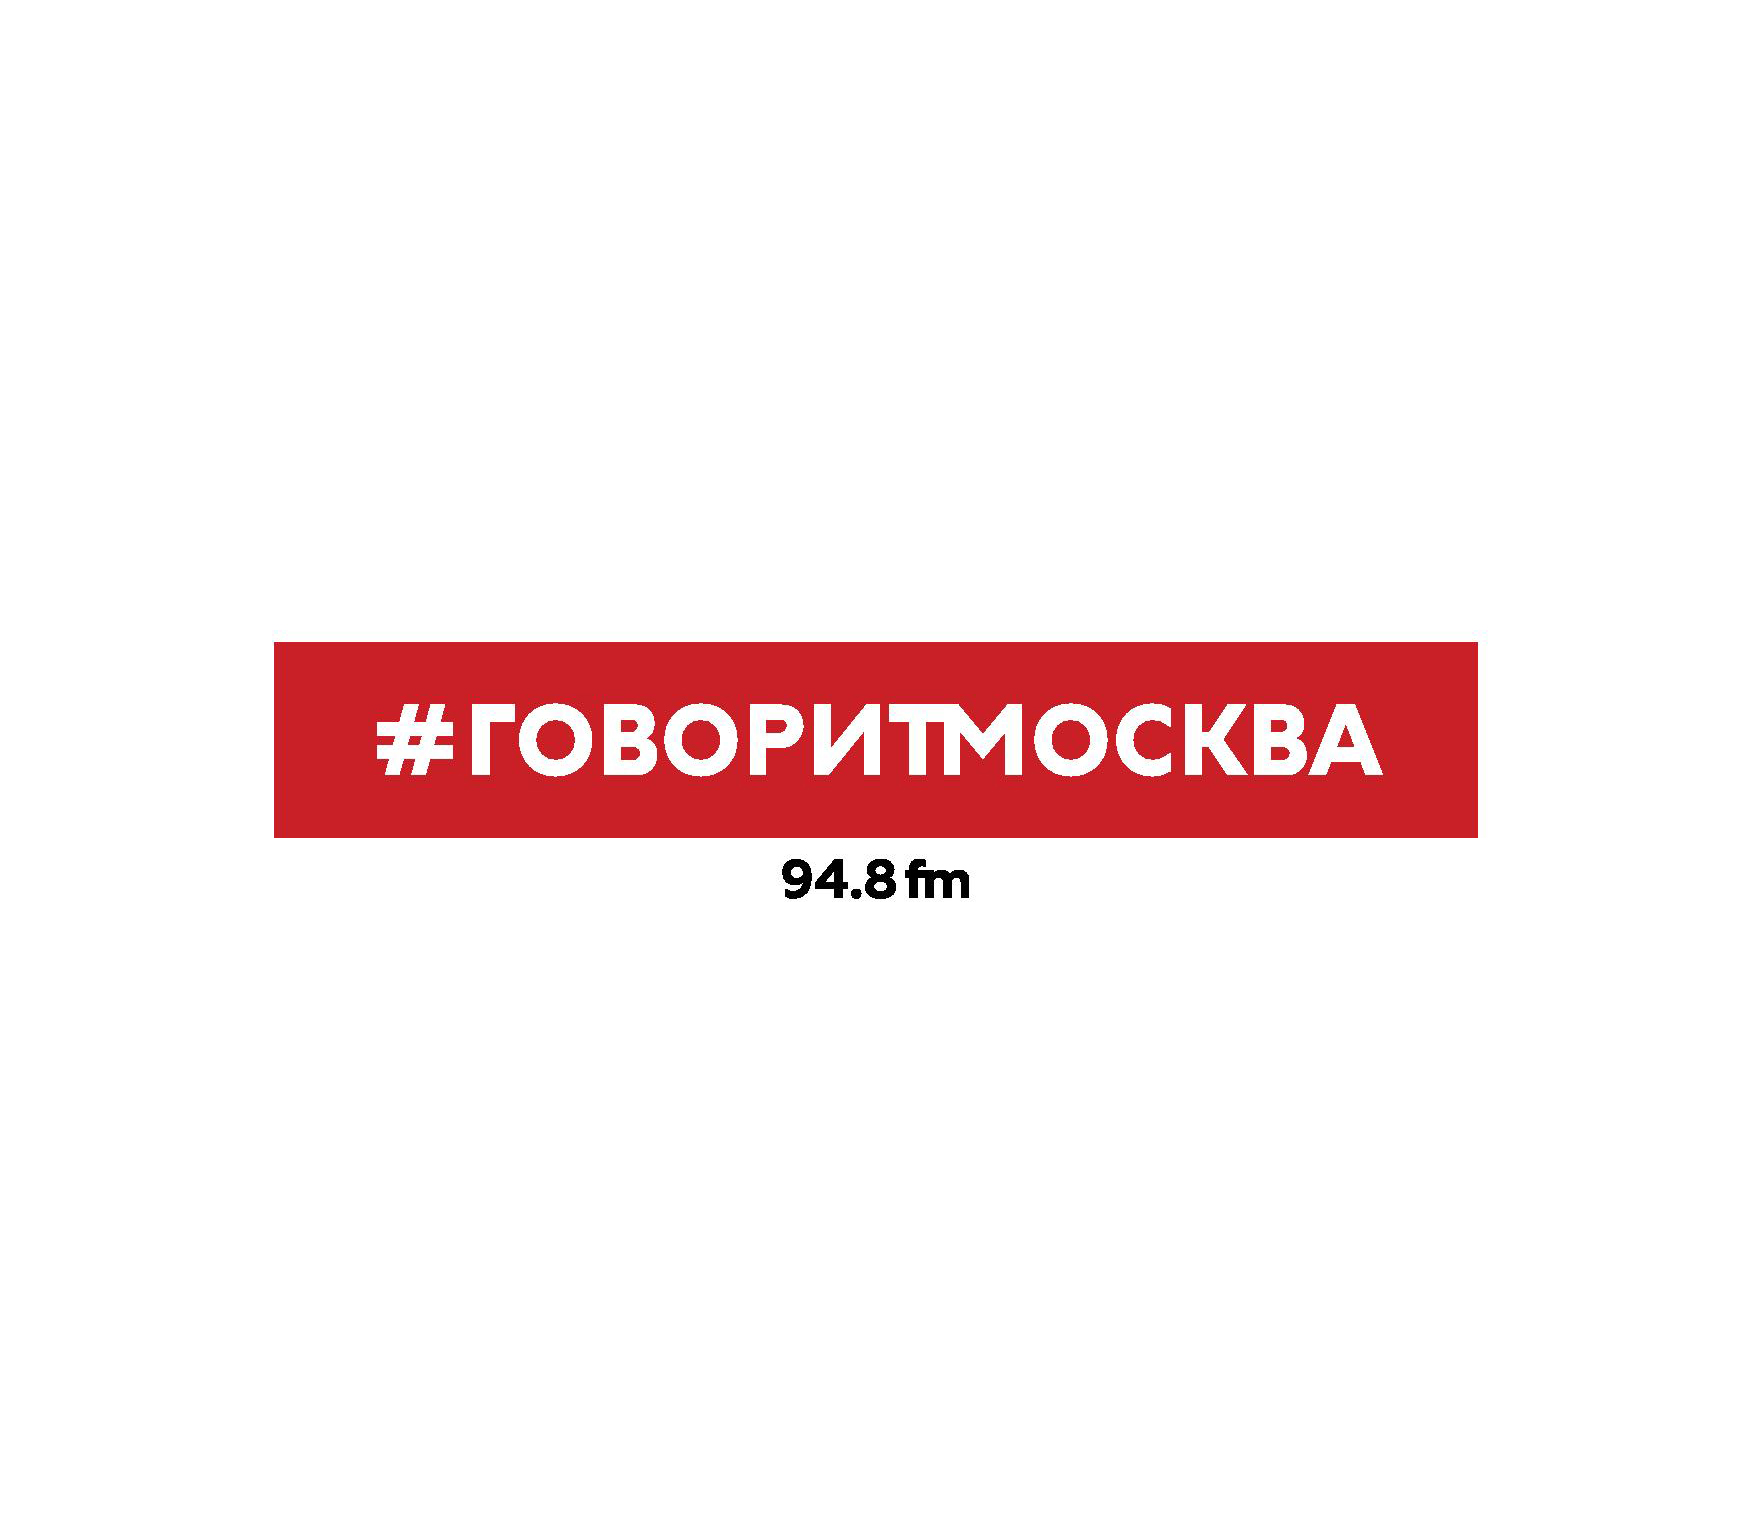 Макс Челноков 3 апреля. Антон Красовский макс челноков 14 апреля андрей орлов